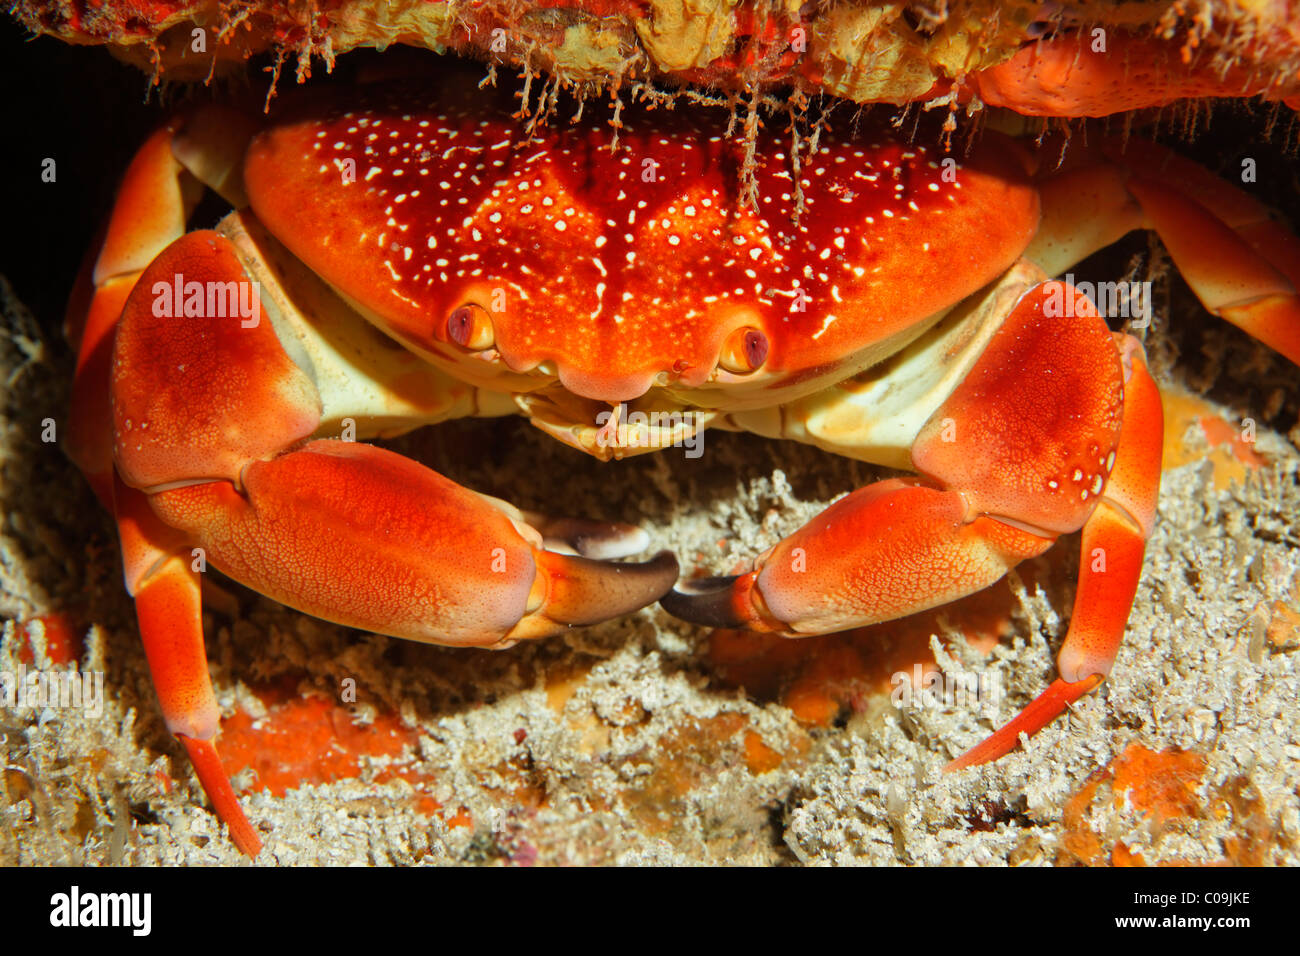 Batwing Coral Crab (Carpilius corallinus), Little Tobago, Speyside, Trinidad and Tobago, Lesser Antilles, Caribbean - Stock Image